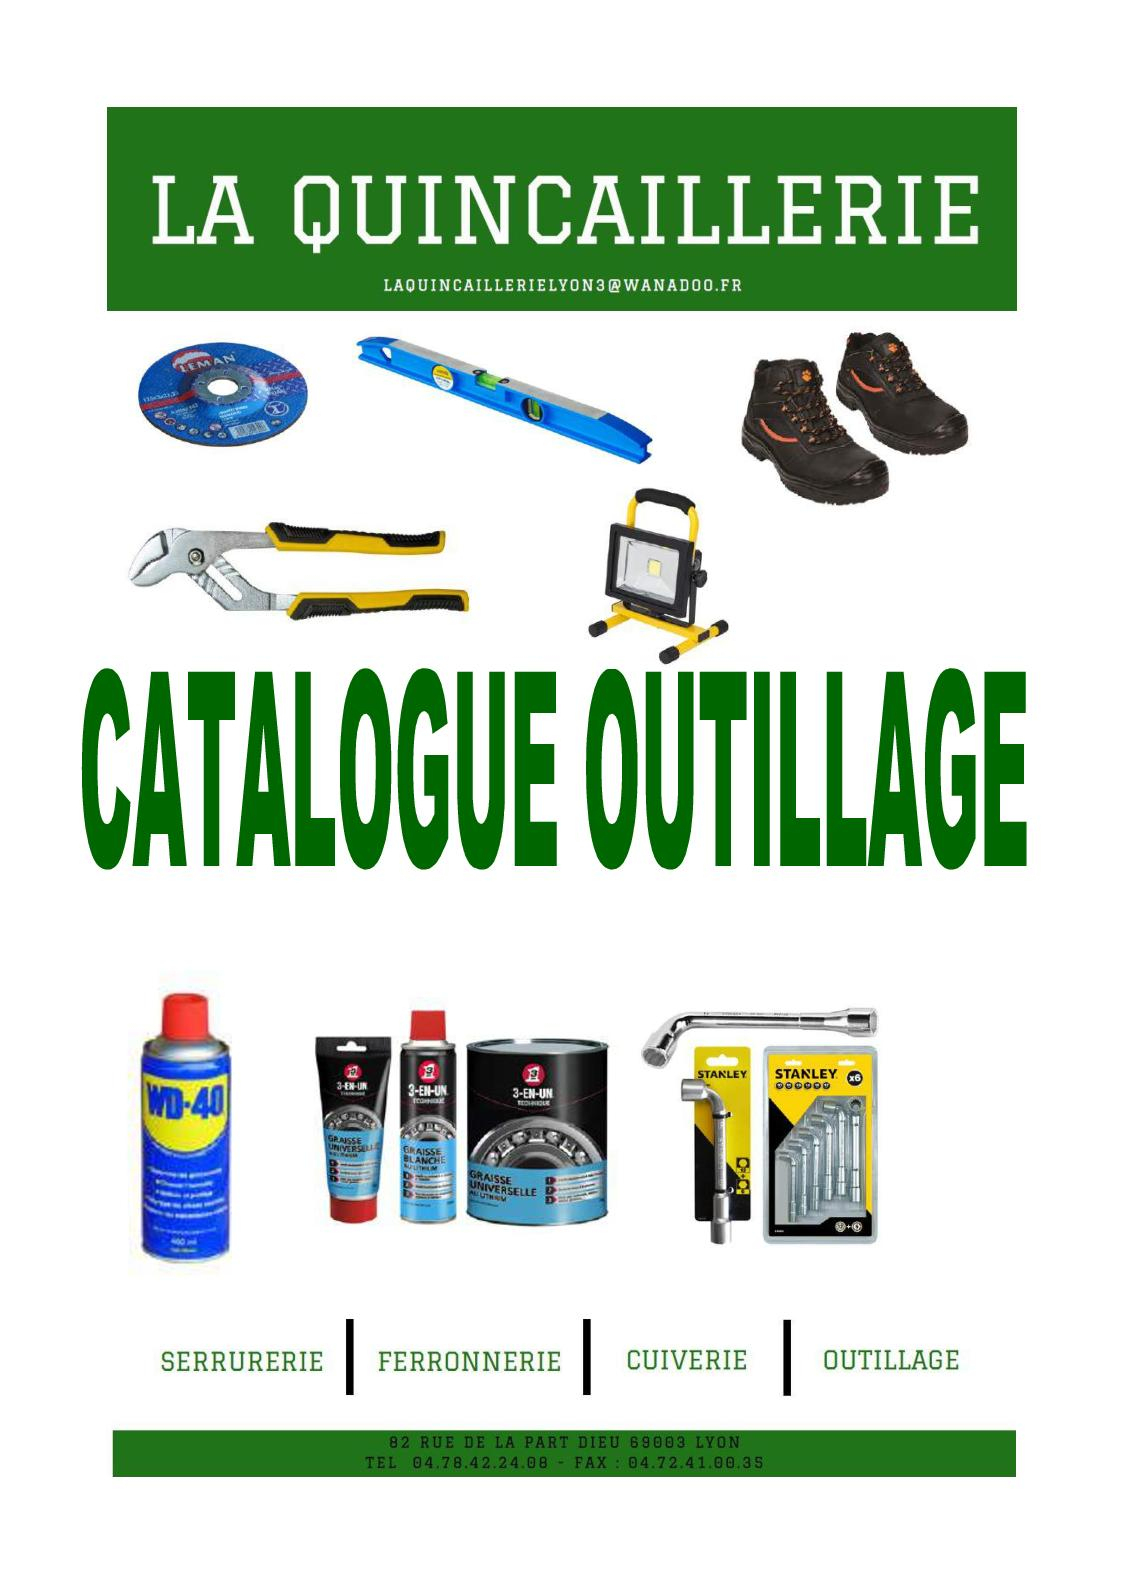 Calaméo - Catalogue Outillage concernant Abri De Jardin Arrow 4 98M2